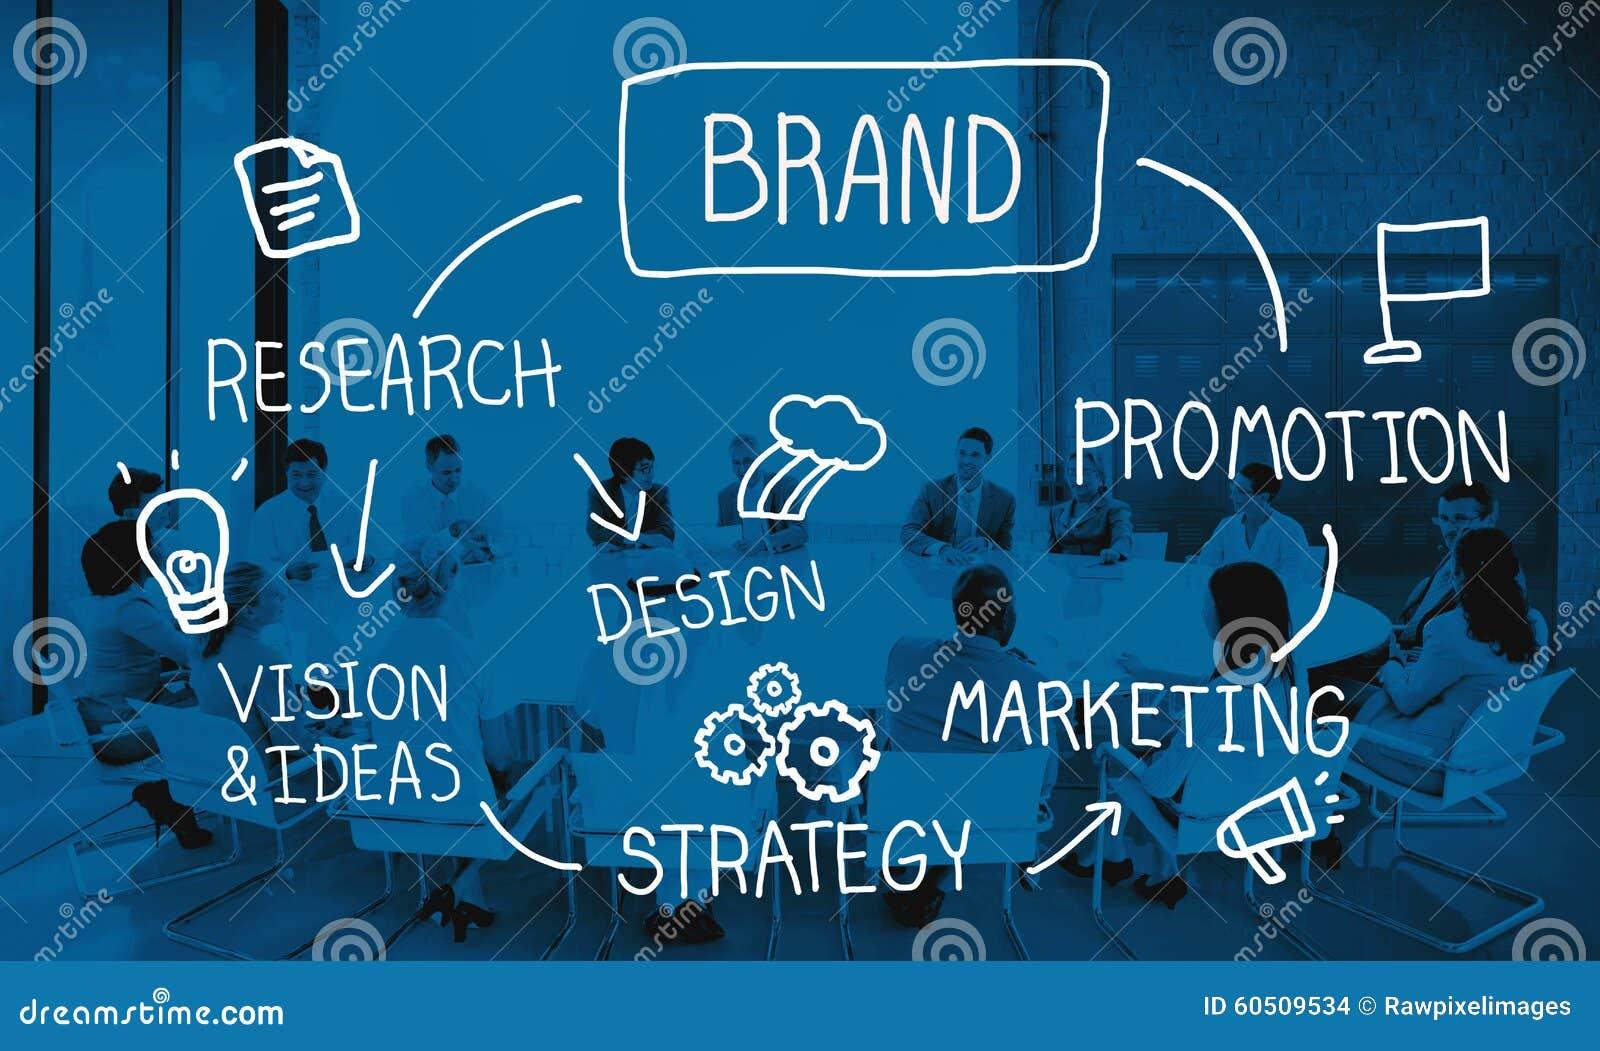 Brand Marketing Advertising Identity Business Trademark